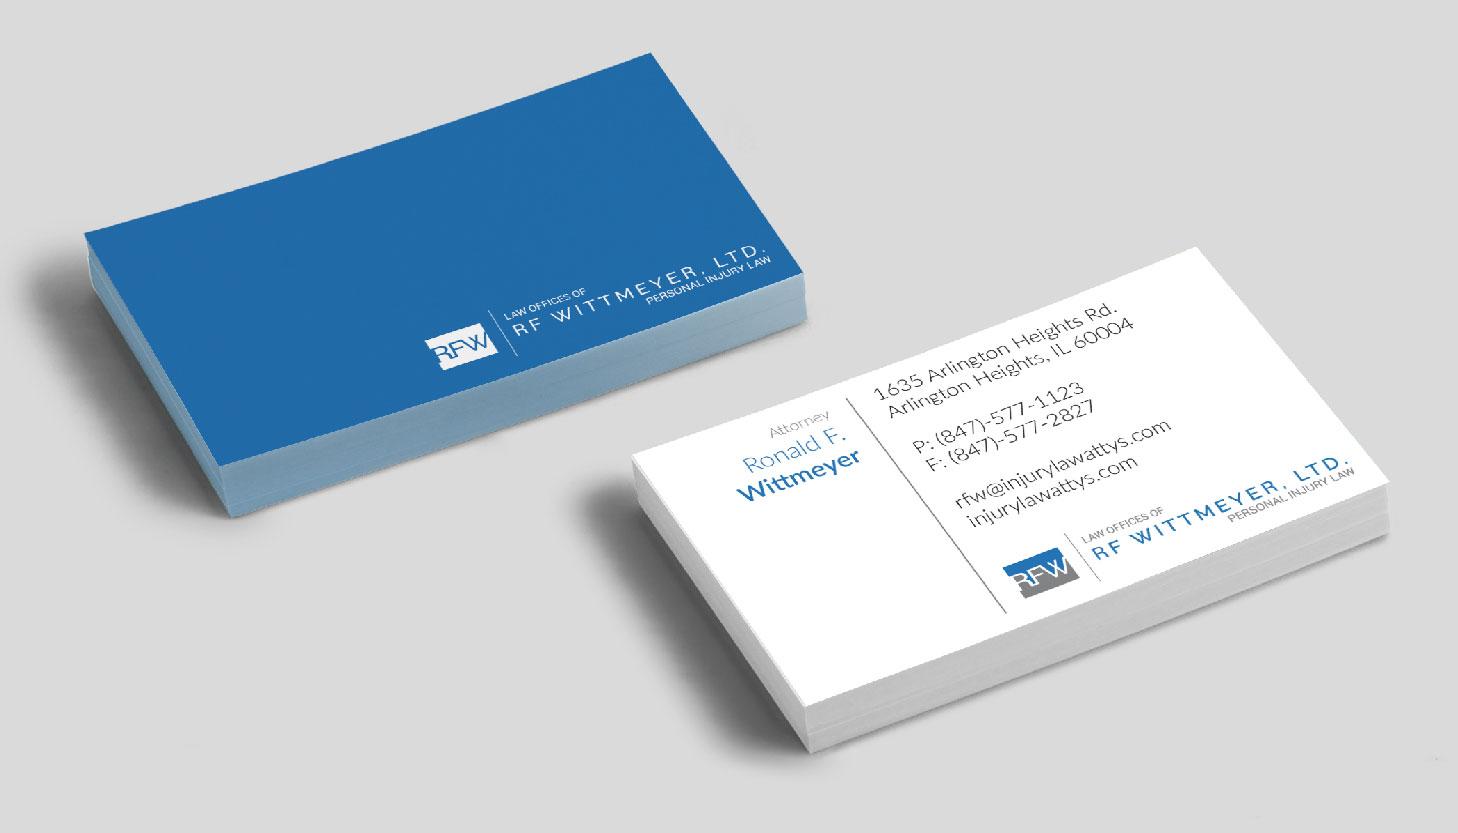 Ron Whittmeyer, LTD | Print Design | Luke Sillies Design